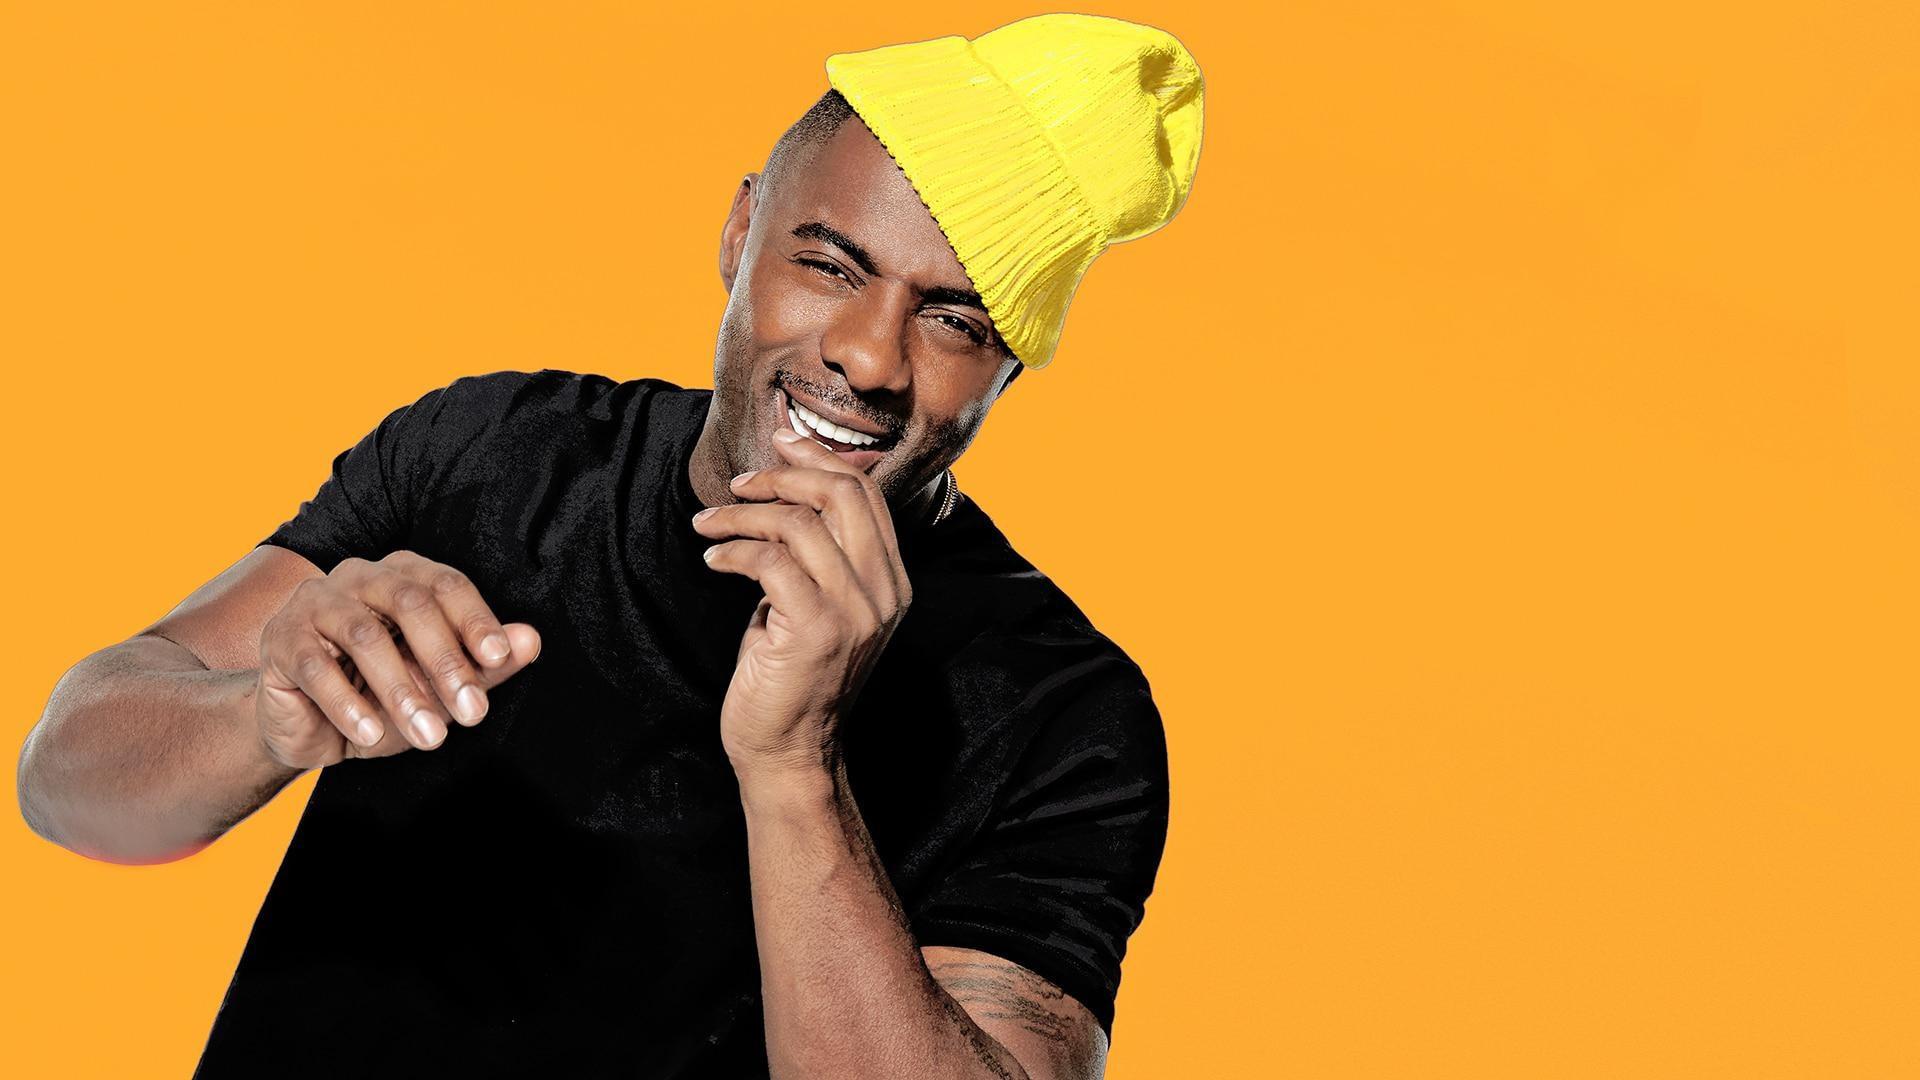 Idris Elba: March 9, 2019